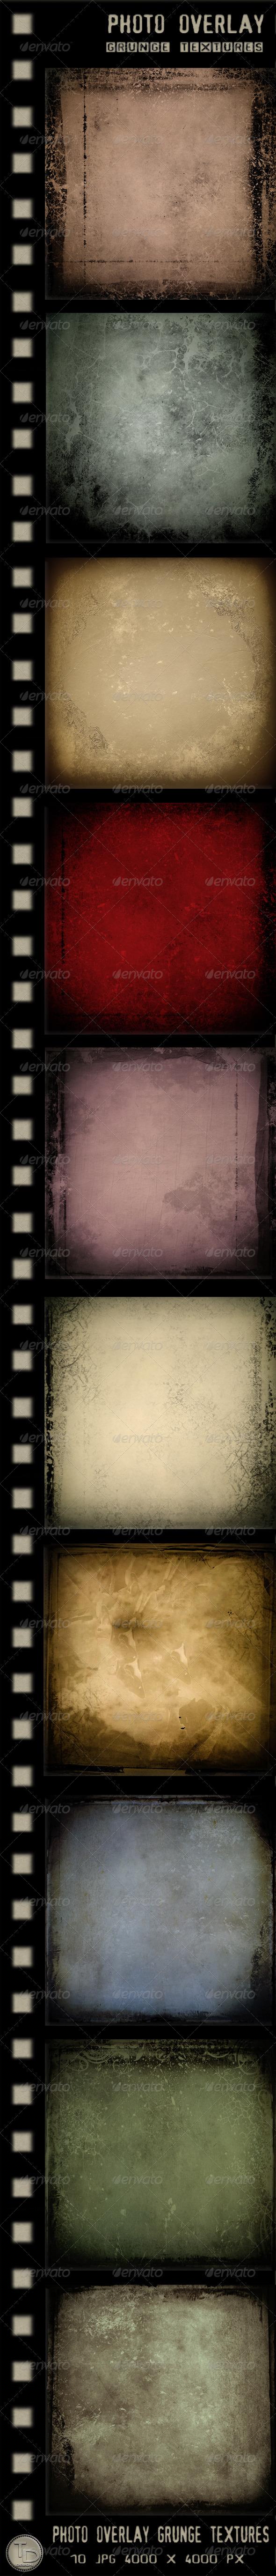 GraphicRiver Photo Overlay Grunge Textures 2798664